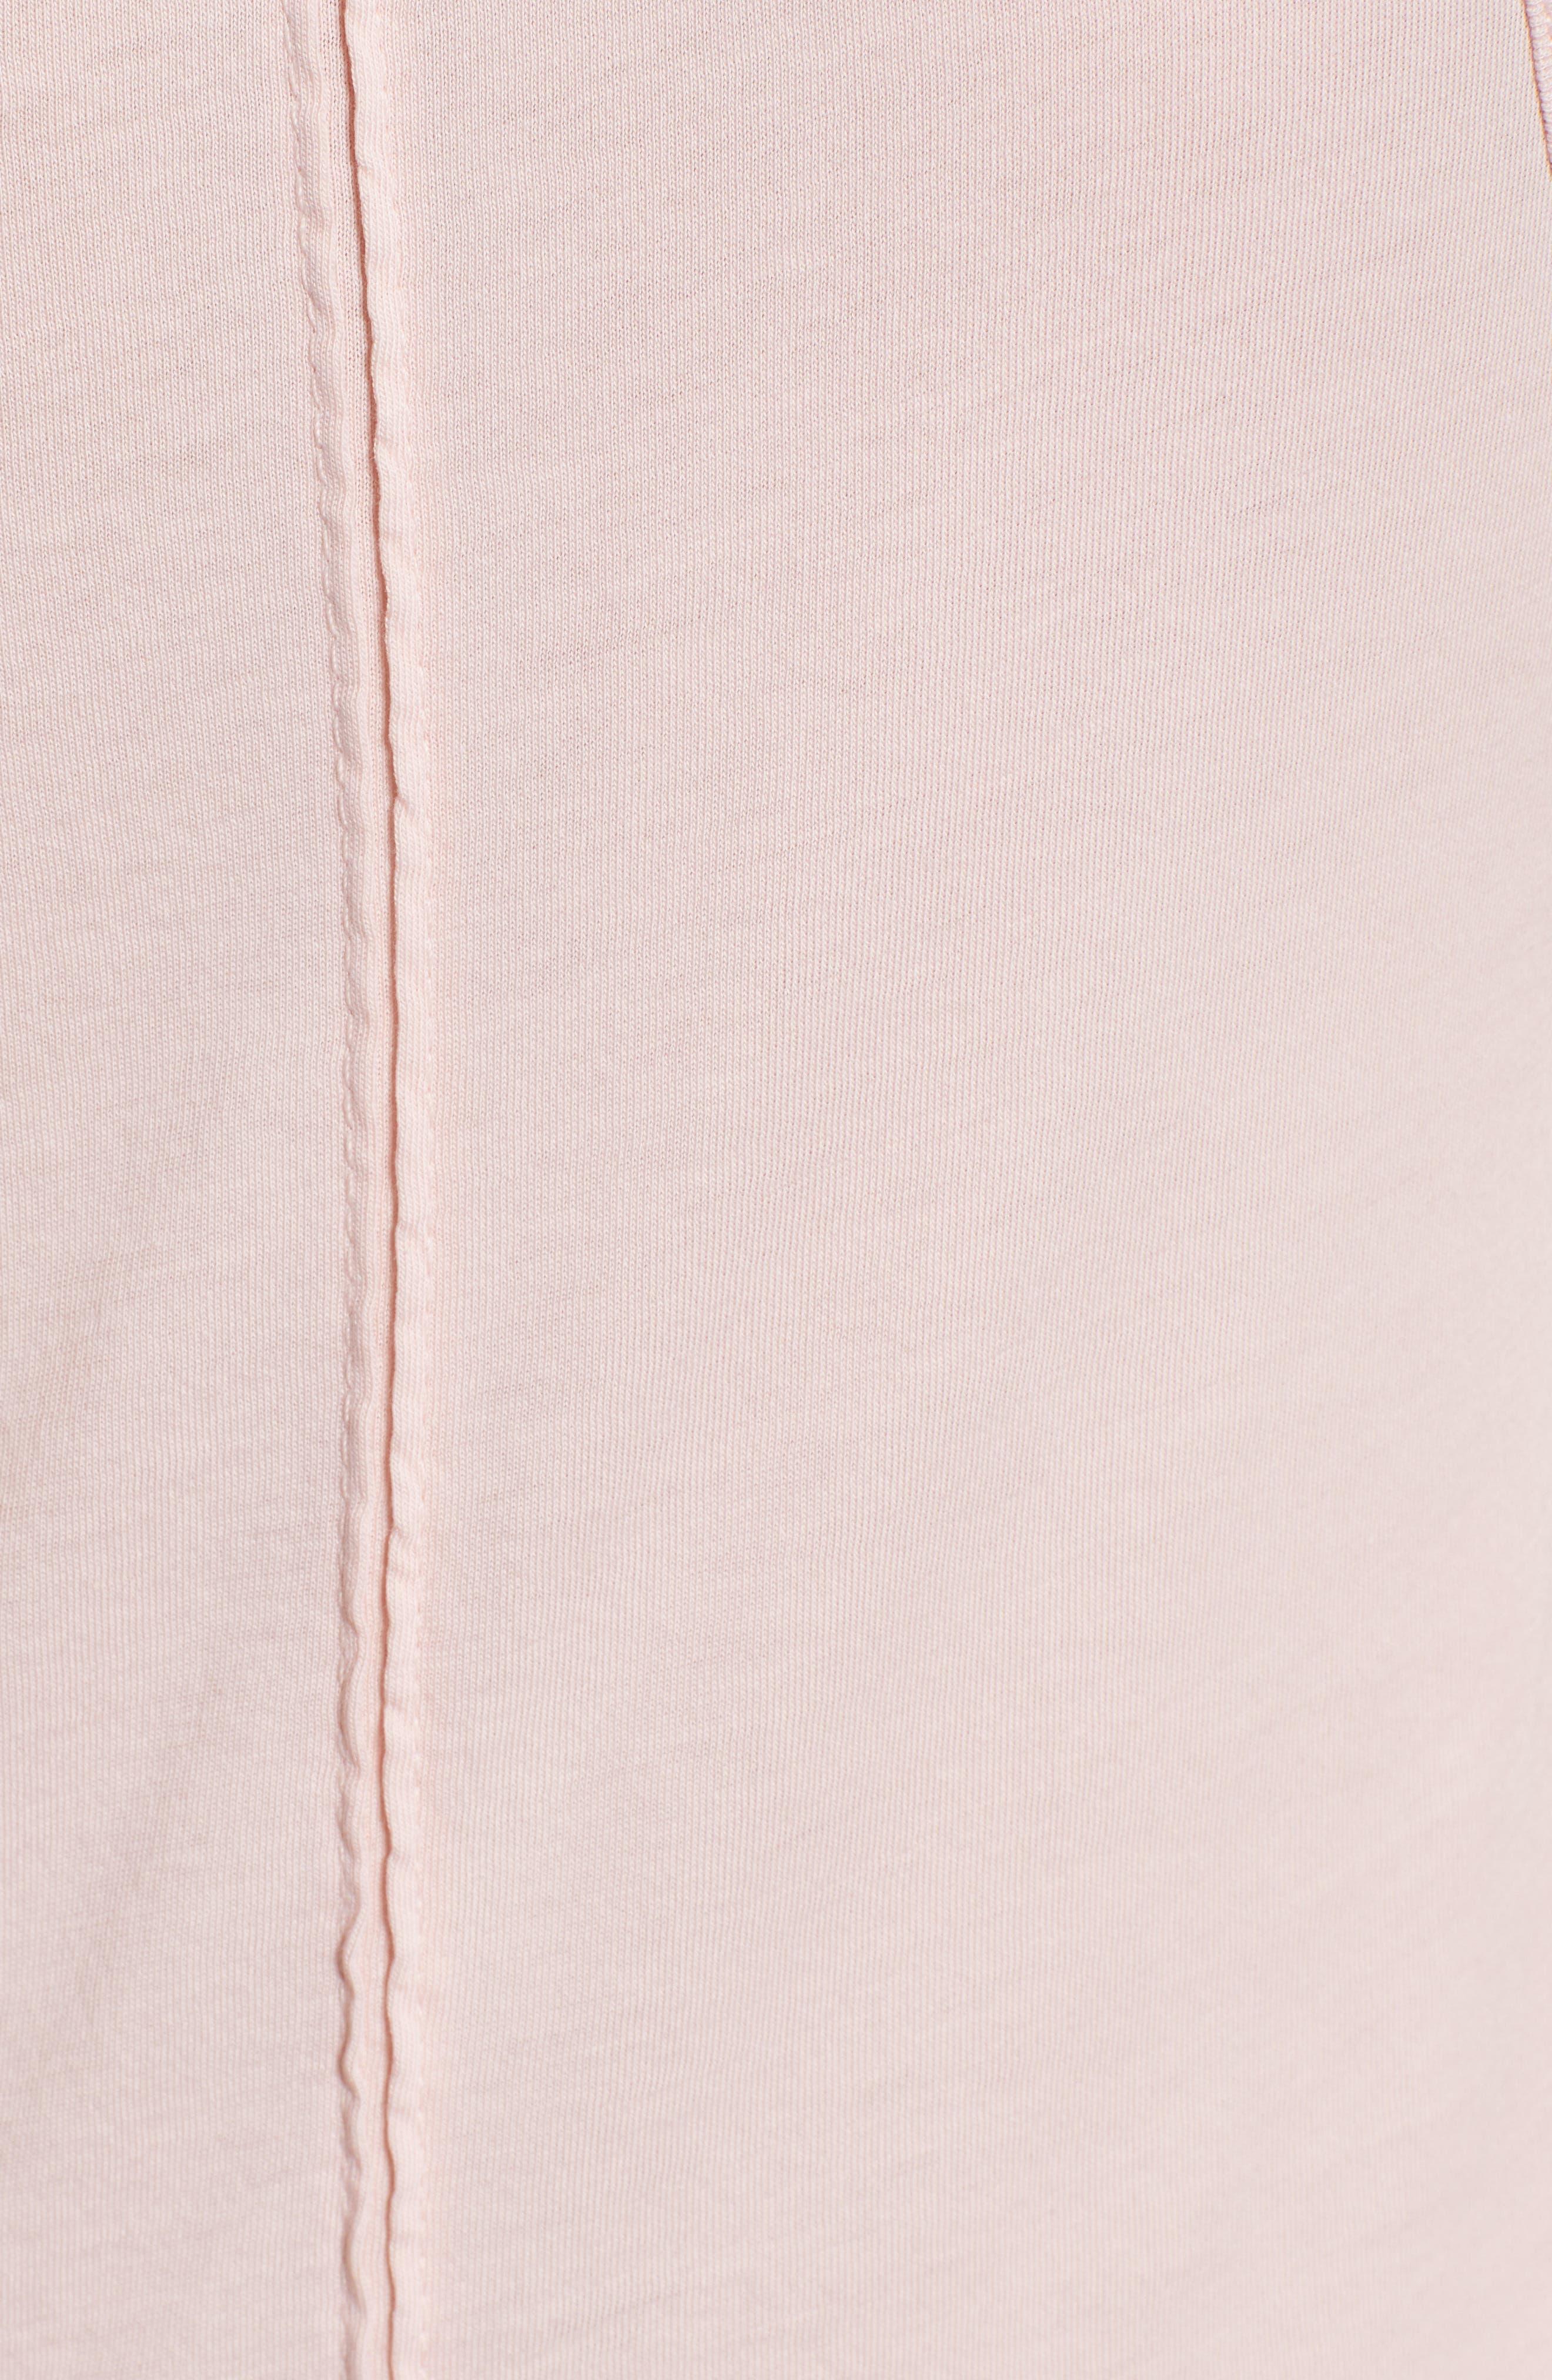 Lexi Tank,                             Alternate thumbnail 4, color,                             Prism Pink